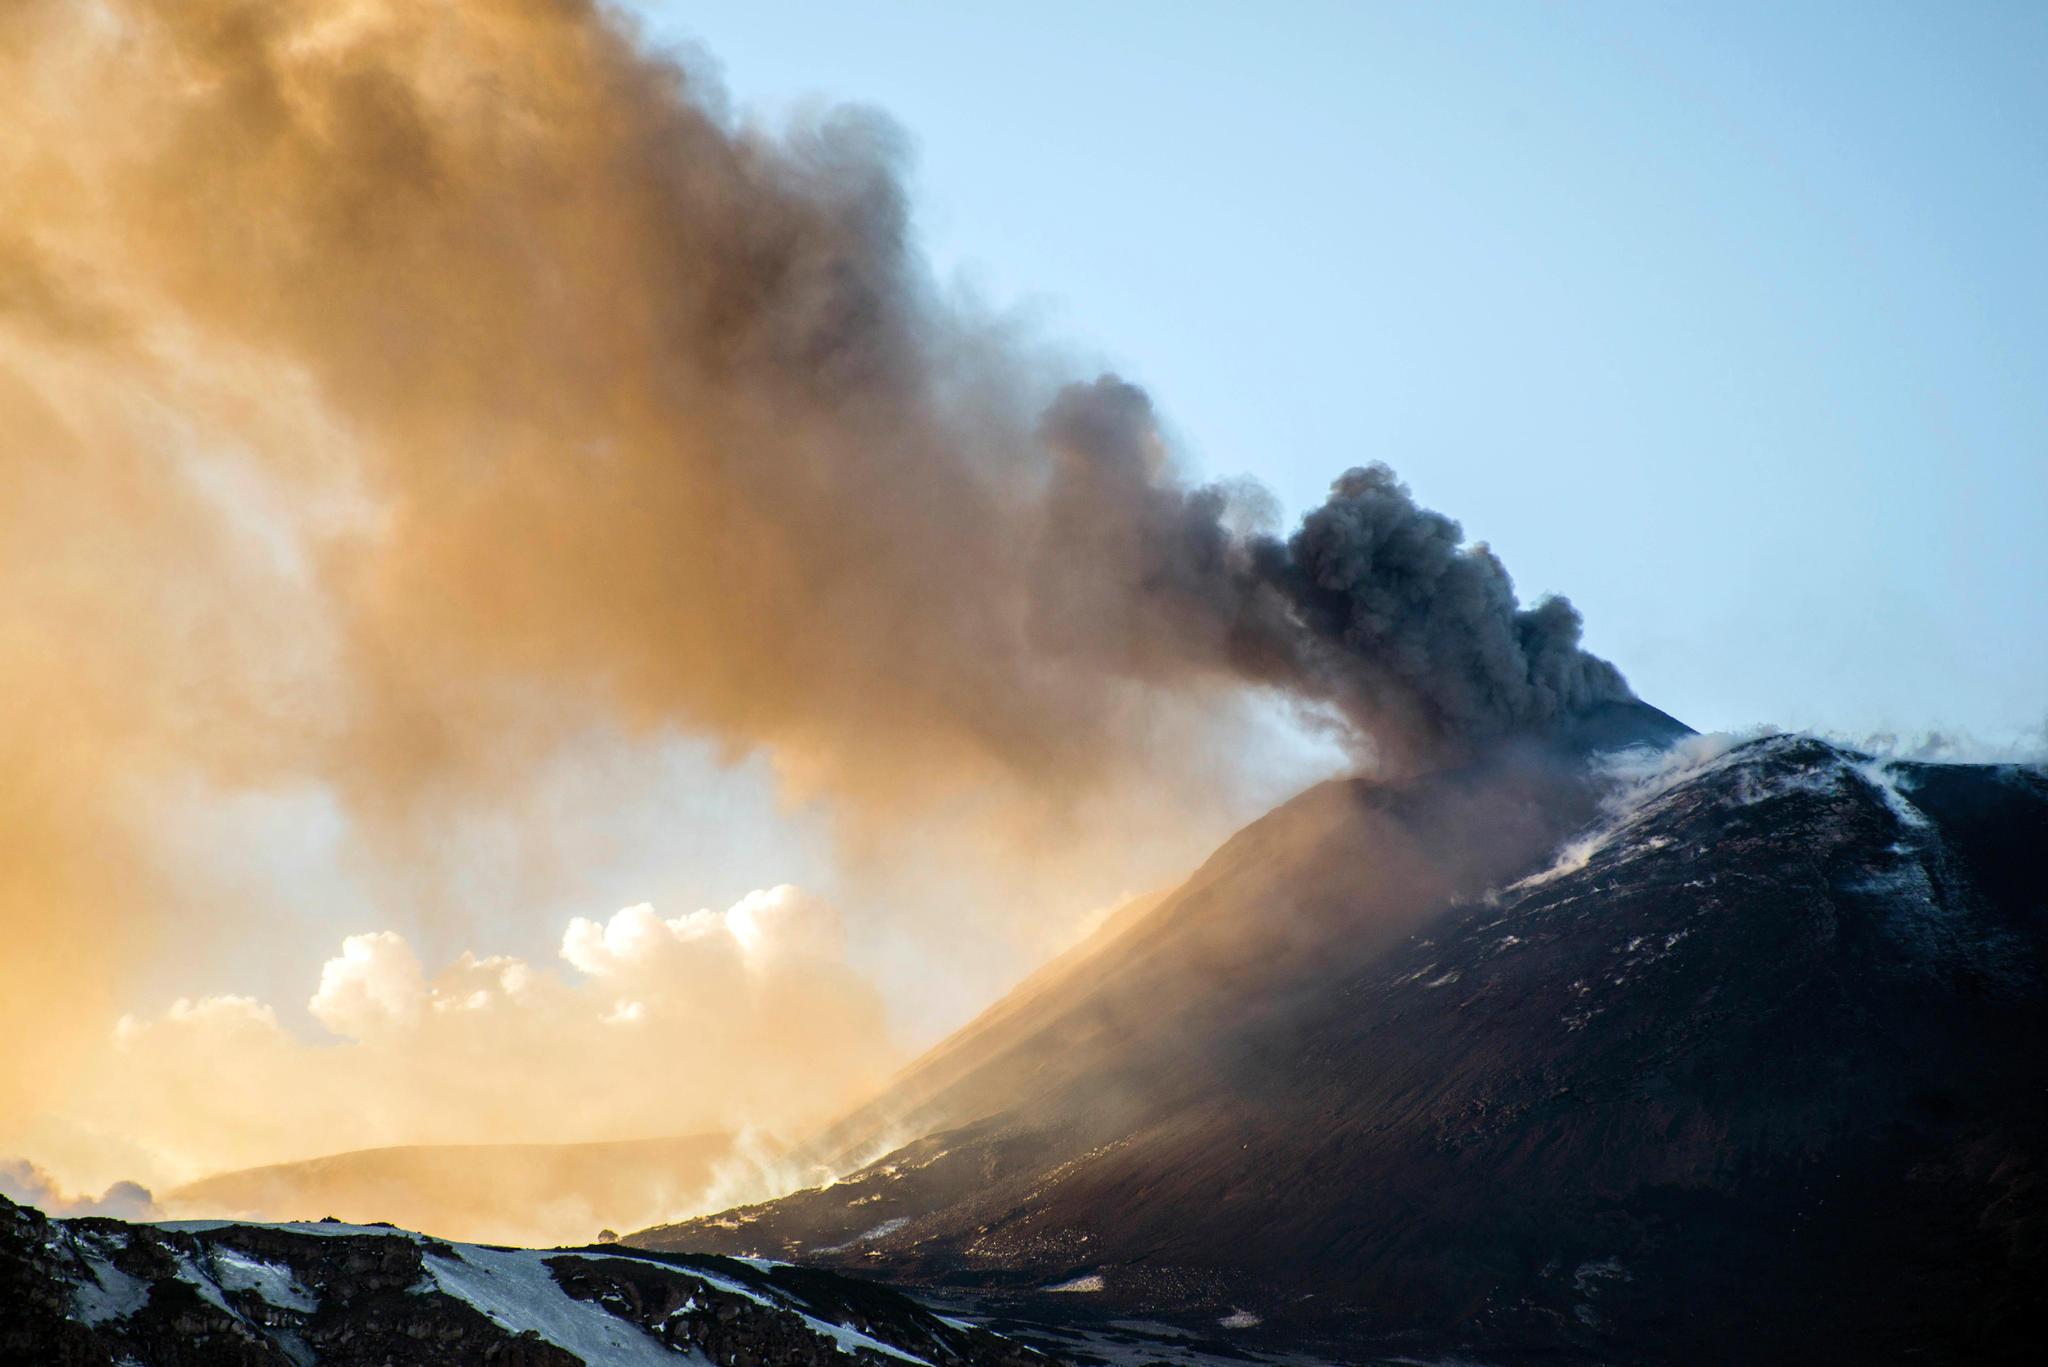 Vulkanausbruch Auf Sizilien